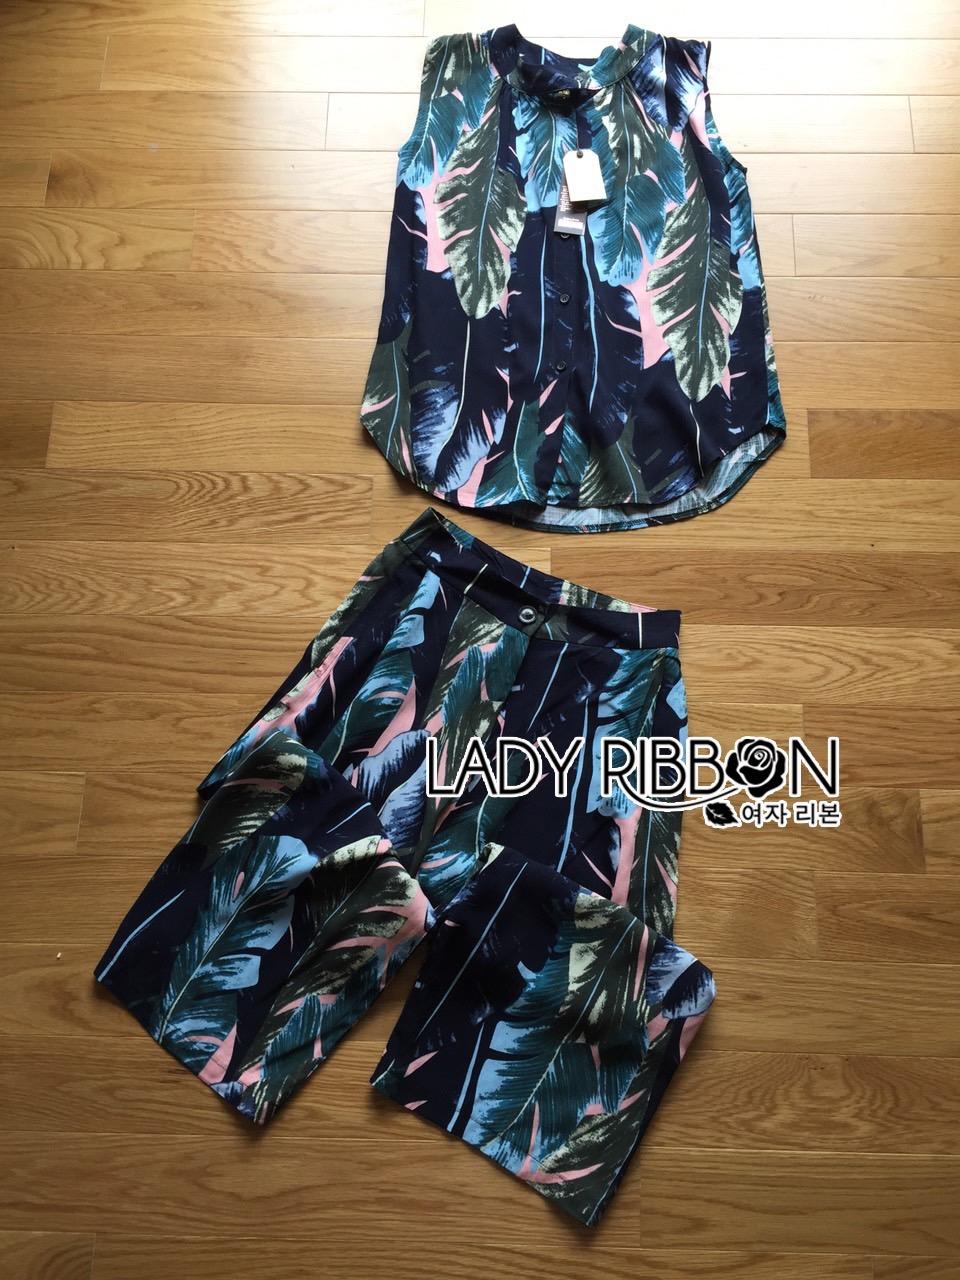 lady ribbon maxi dress